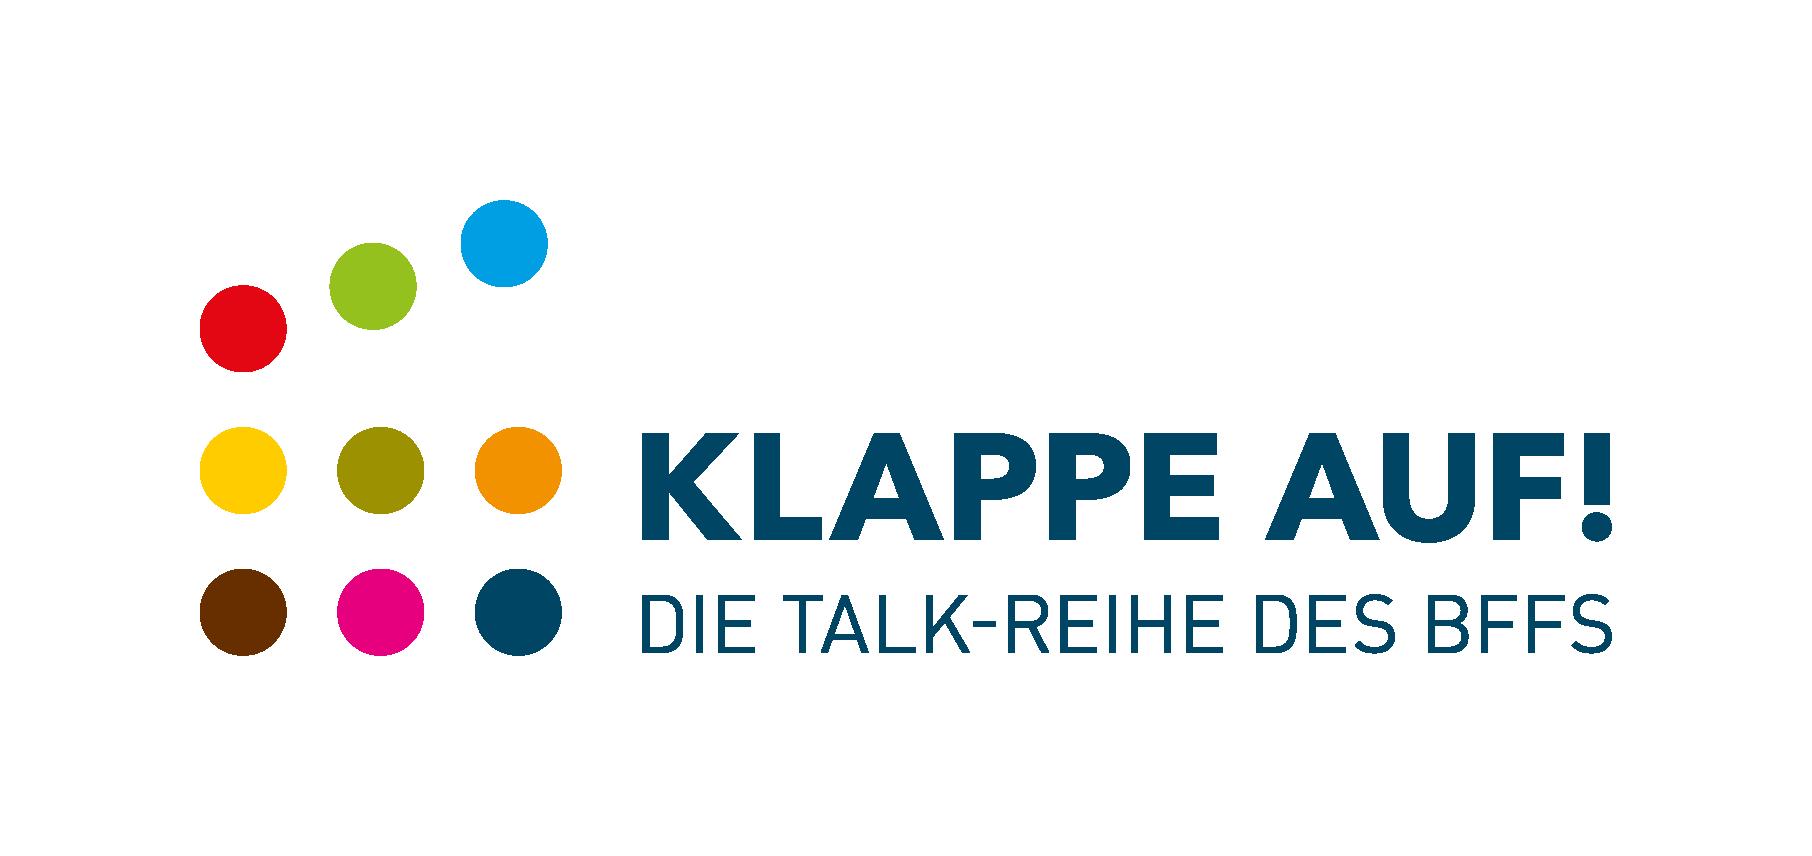 Nicolai Rohde & Sebastian Faust / BFFS Klappe Auf! Hamburg 2018 | Klappe auf!